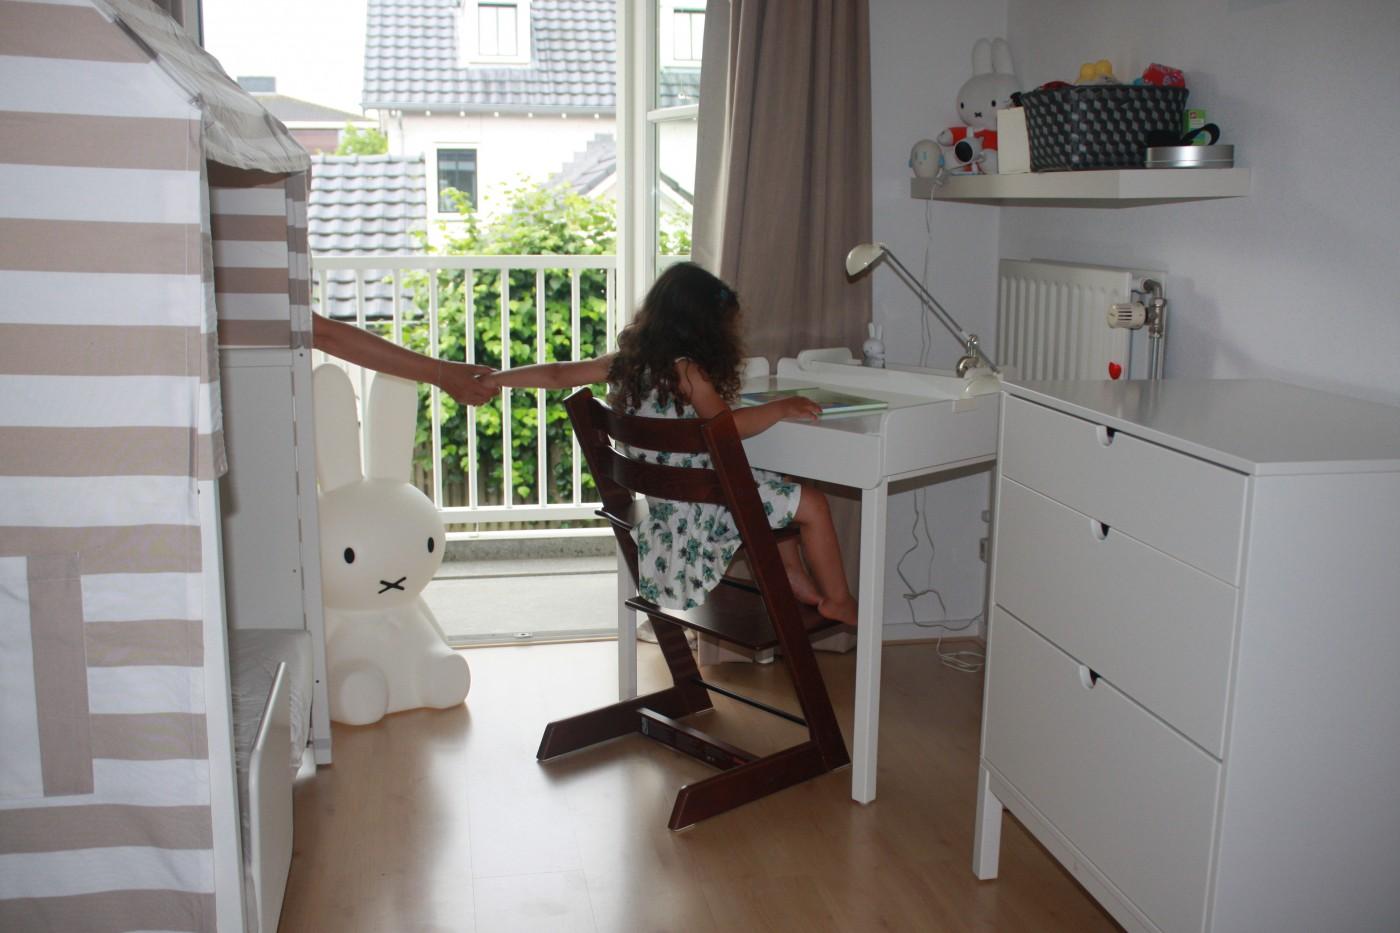 Te Kleine Slaapkamer : Weinig ruimte kleine of zelfs geen kinderkamer